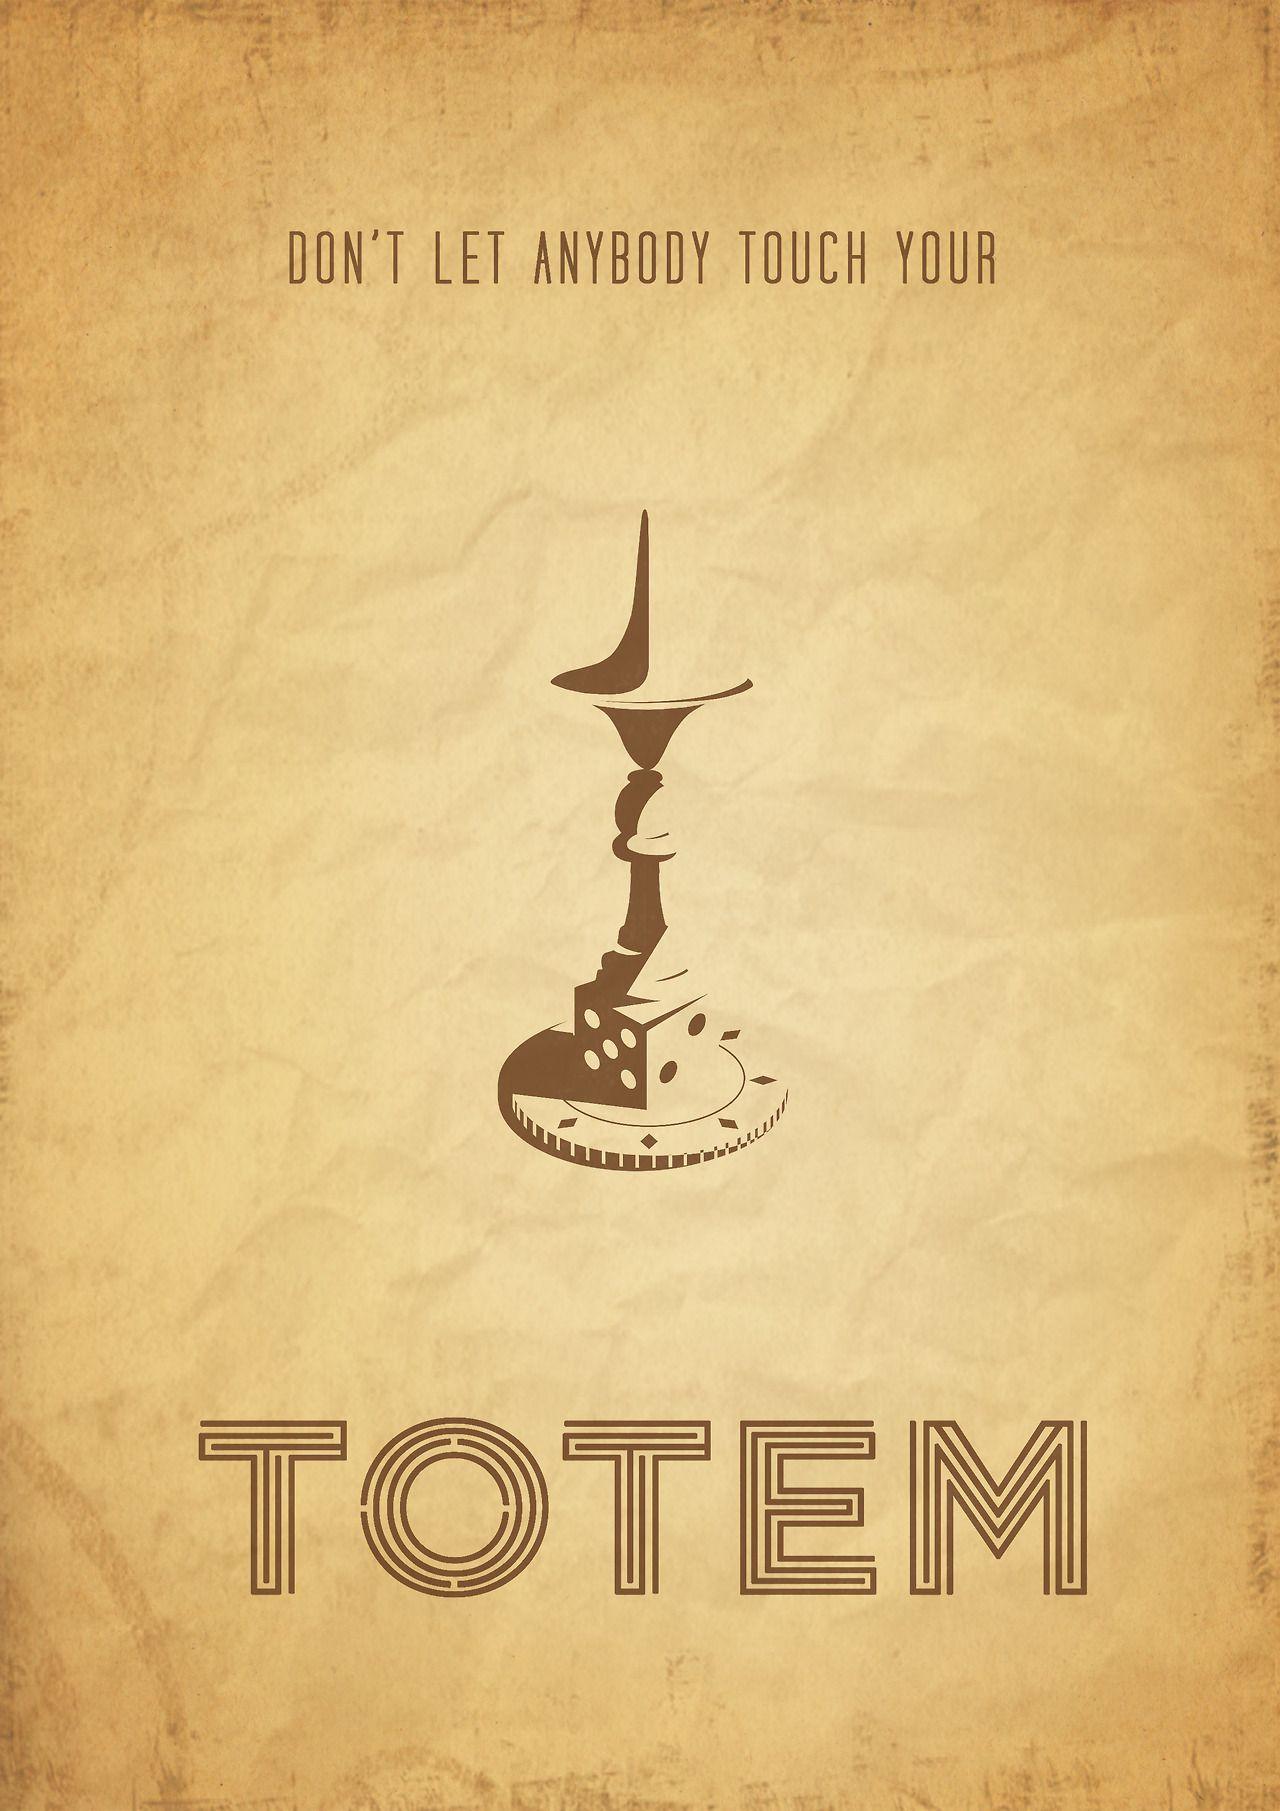 inception totem poster lorenzofrestatumblrcom My place